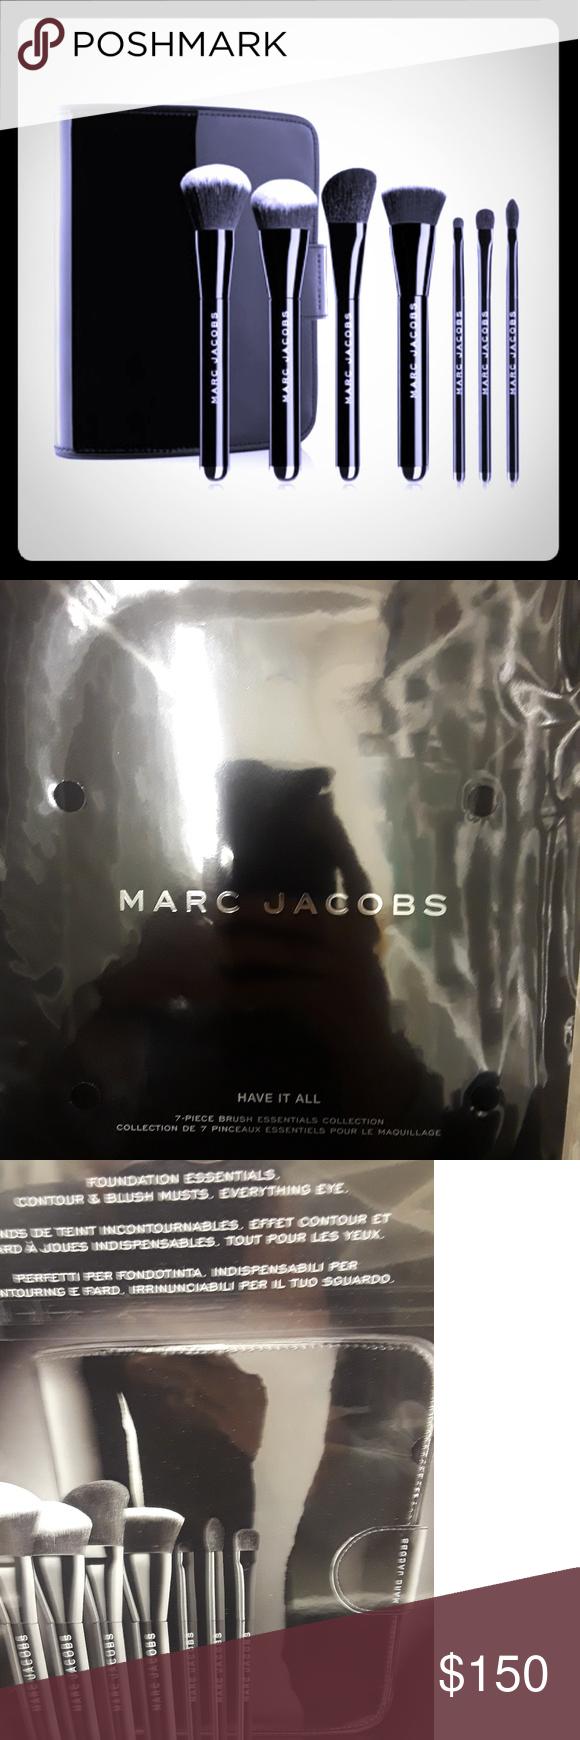 "Marc Jacobs ""have it all"" 7 piece brush set Marc jacobs"